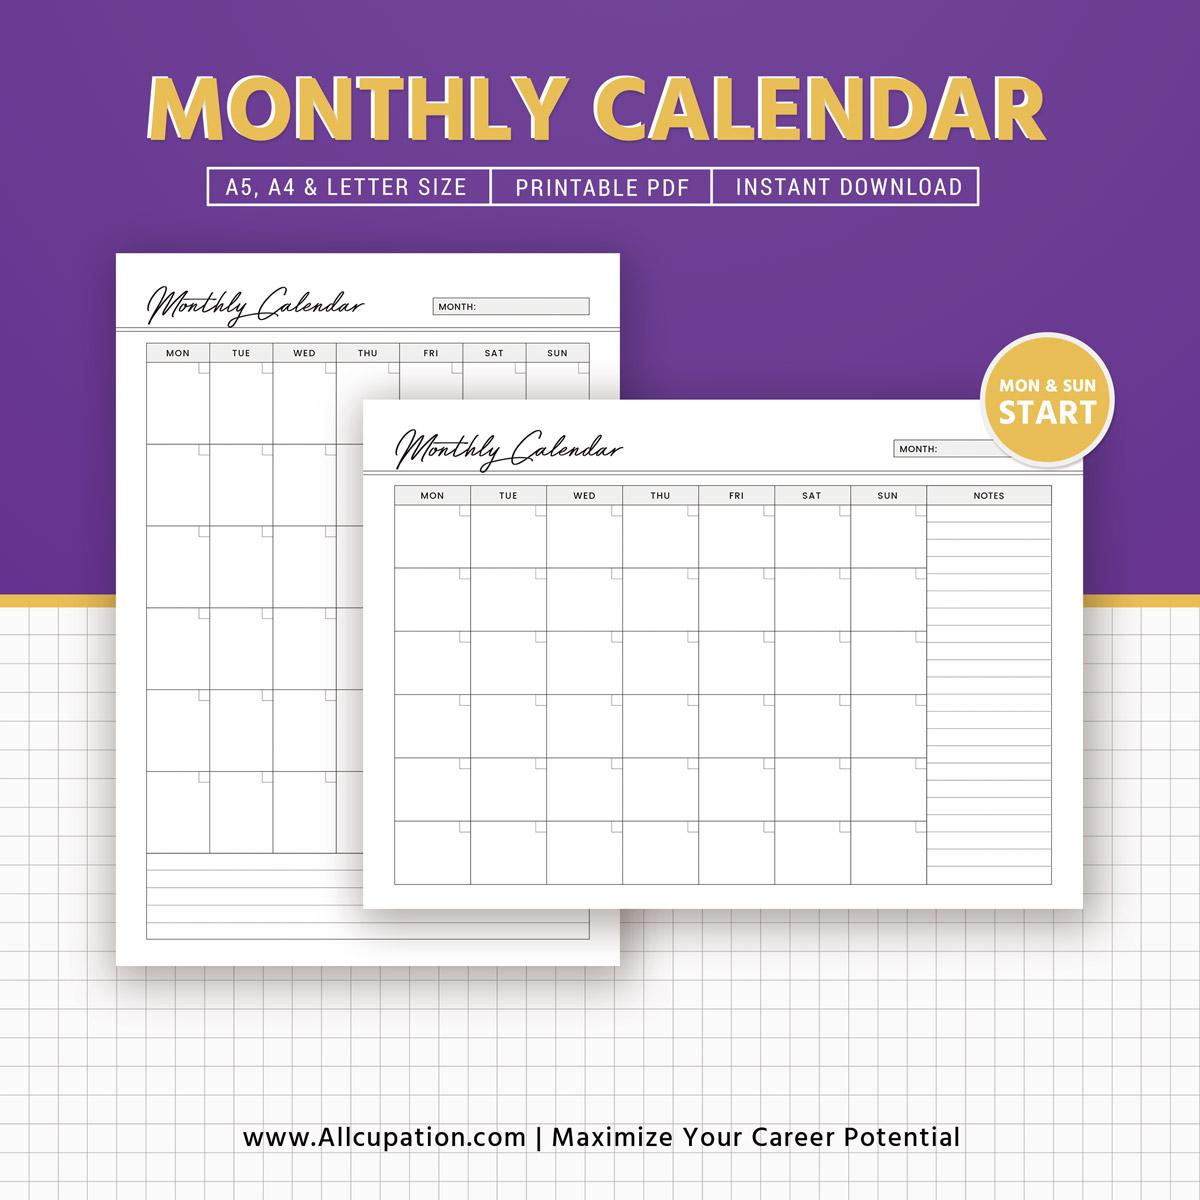 free monthly calendar template 2018 2019 monthly calendar template